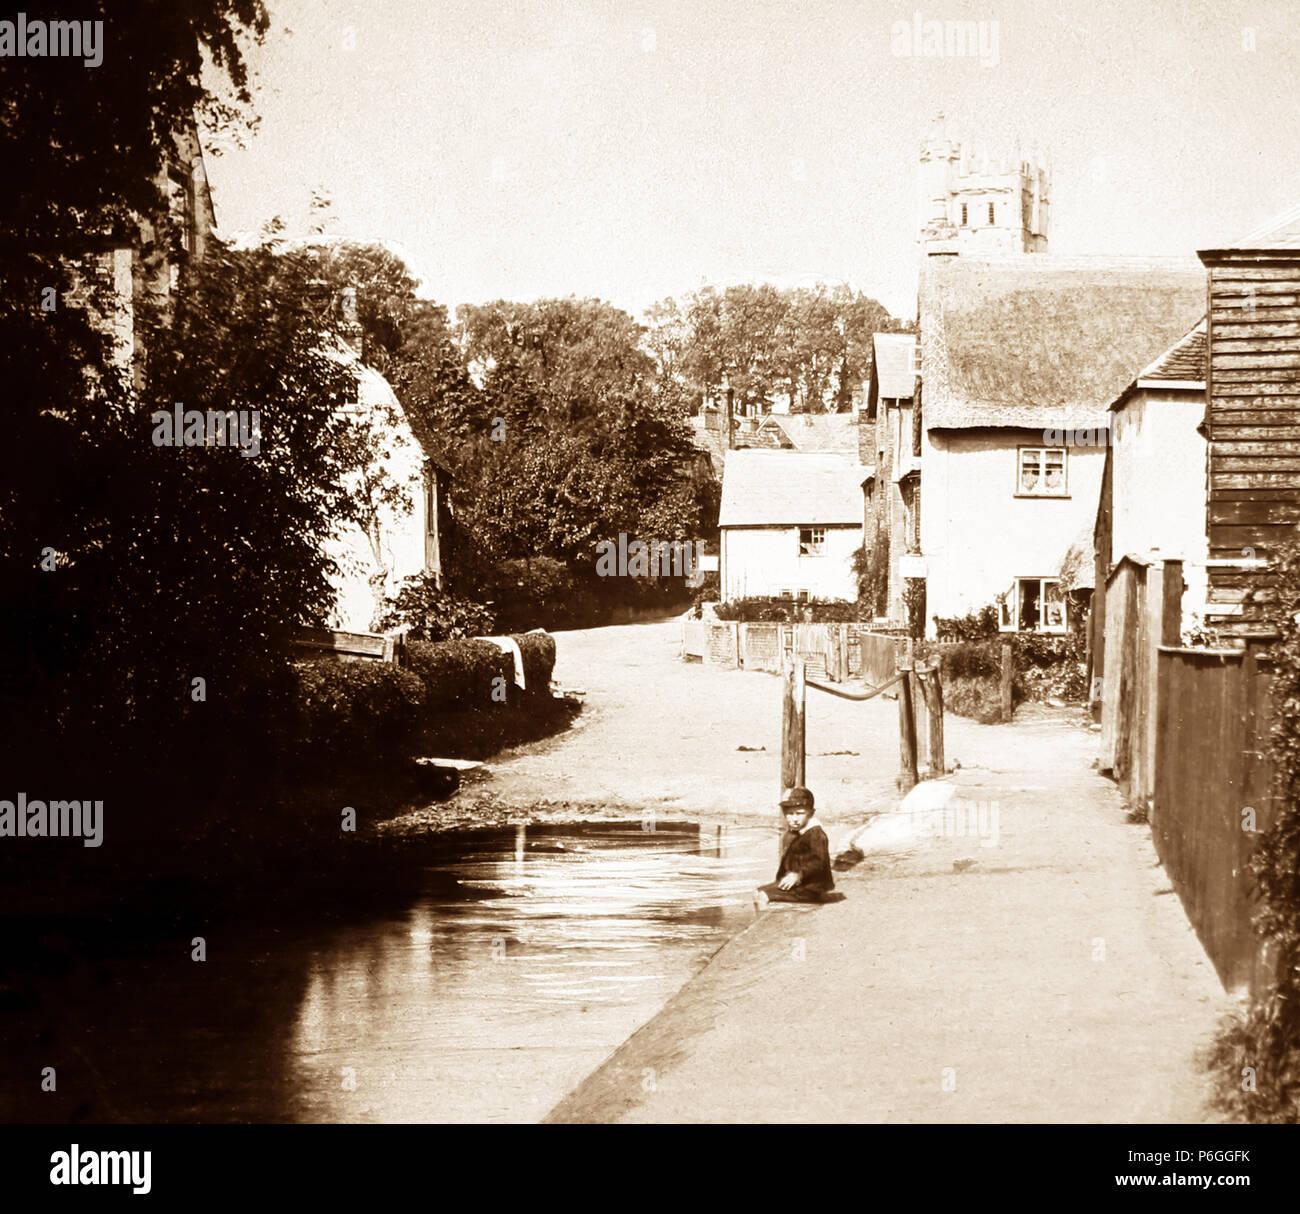 Carisbrooke, Isle of Wight, Victorian period Stock Photo